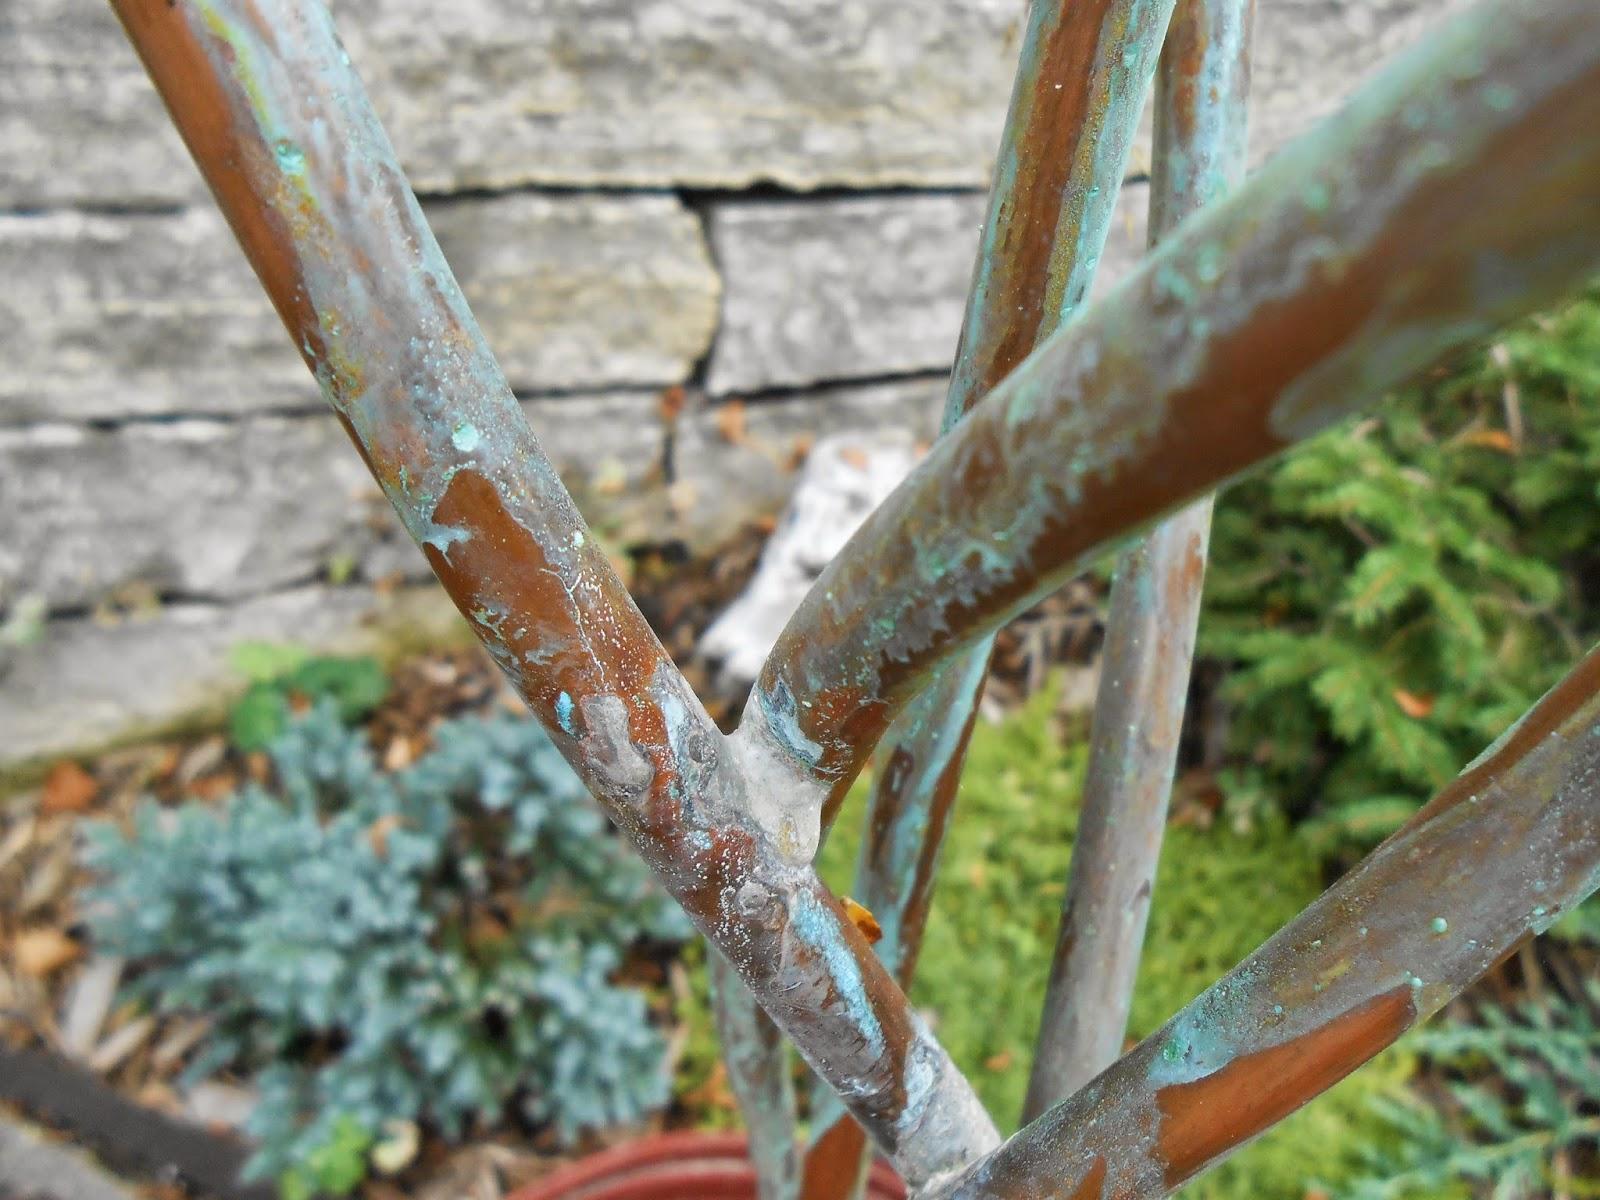 Sproutsandstuff: DIY Copper Garden Art from Copper Tubing